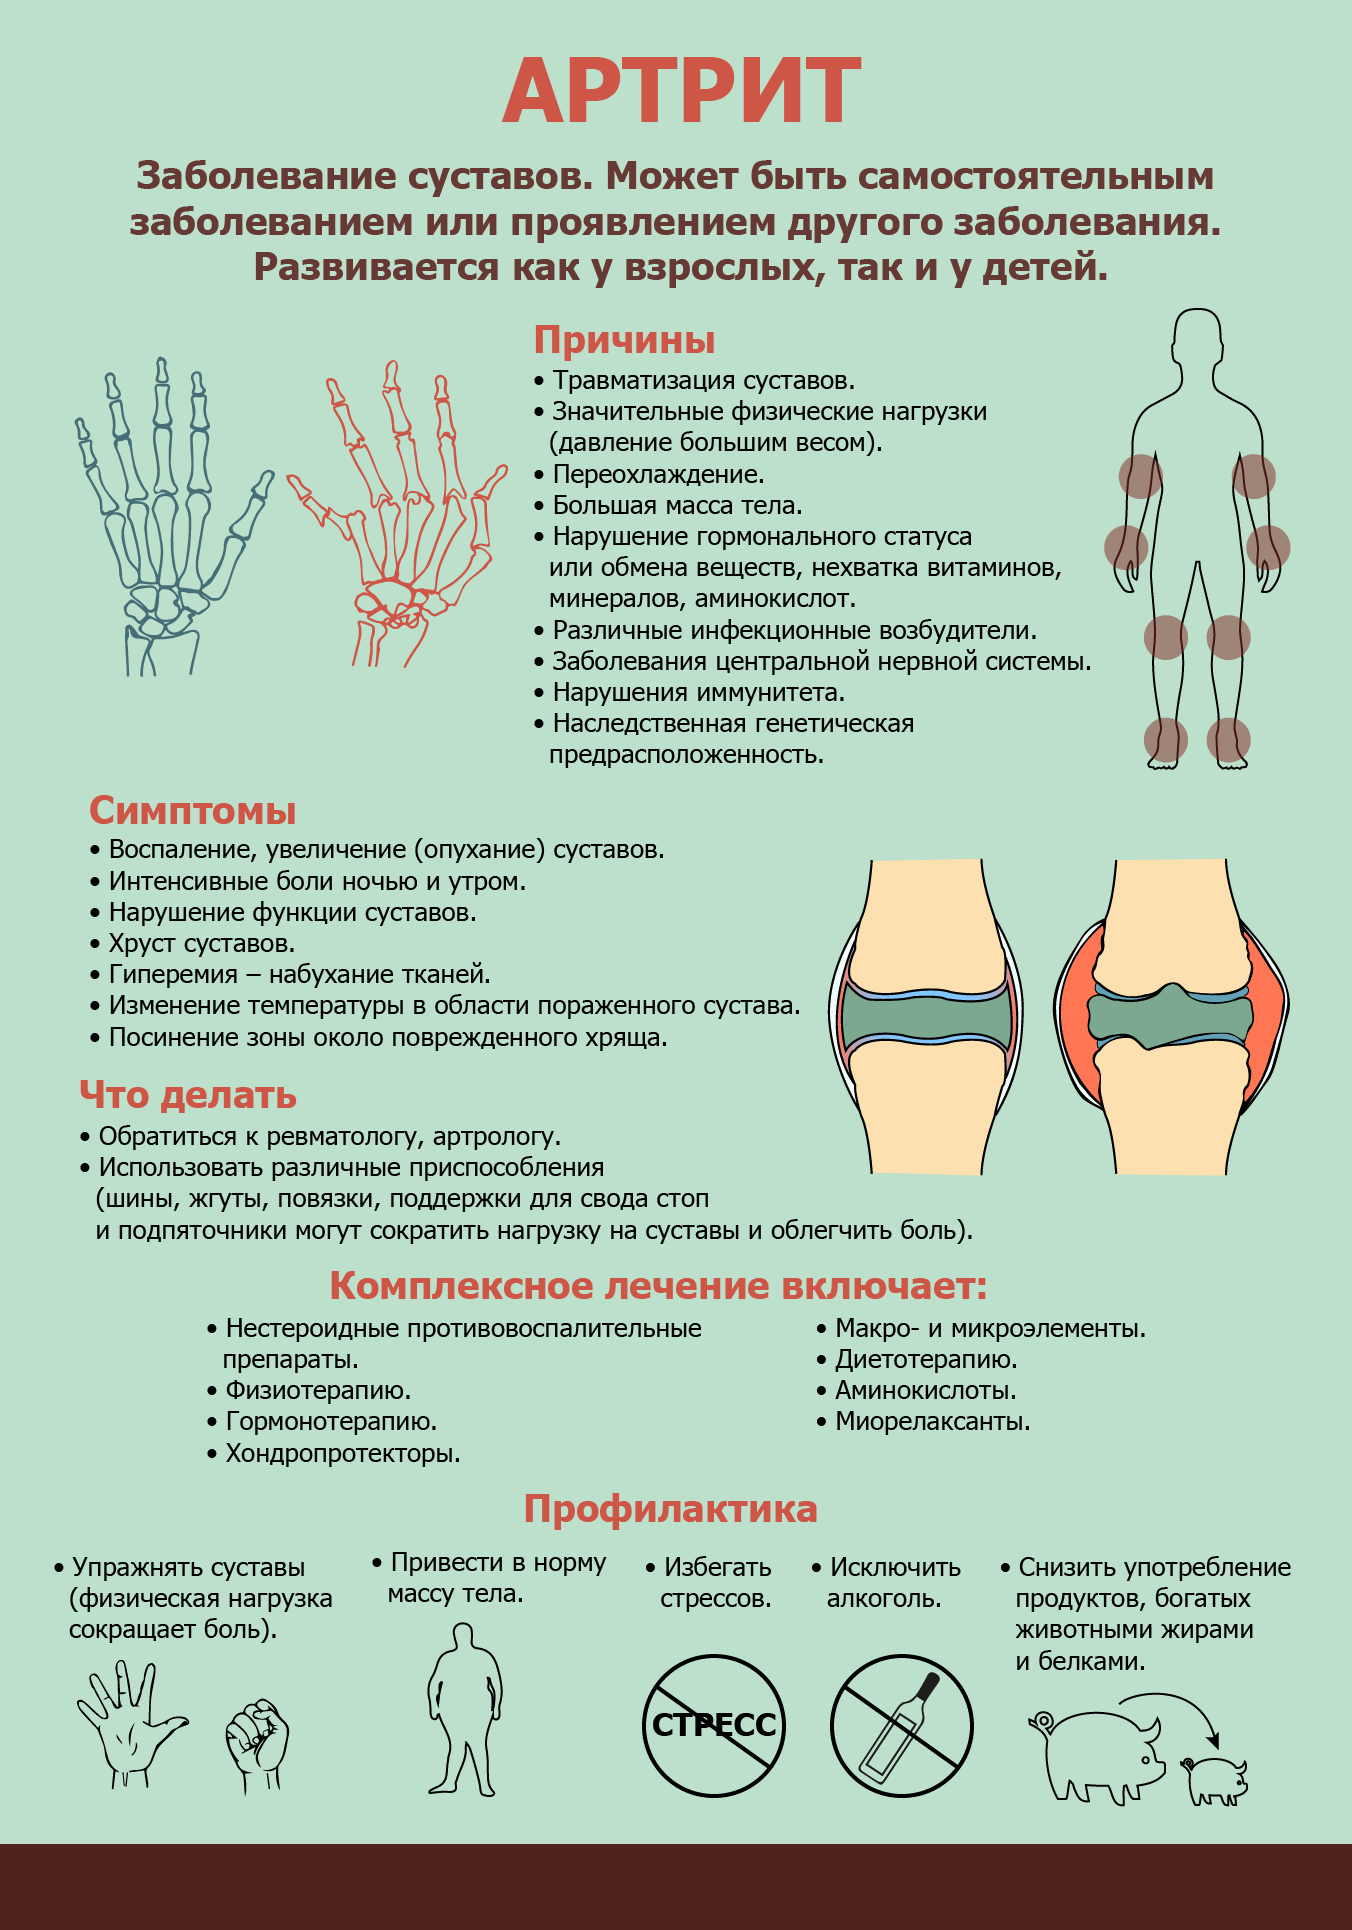 Информация об артрите